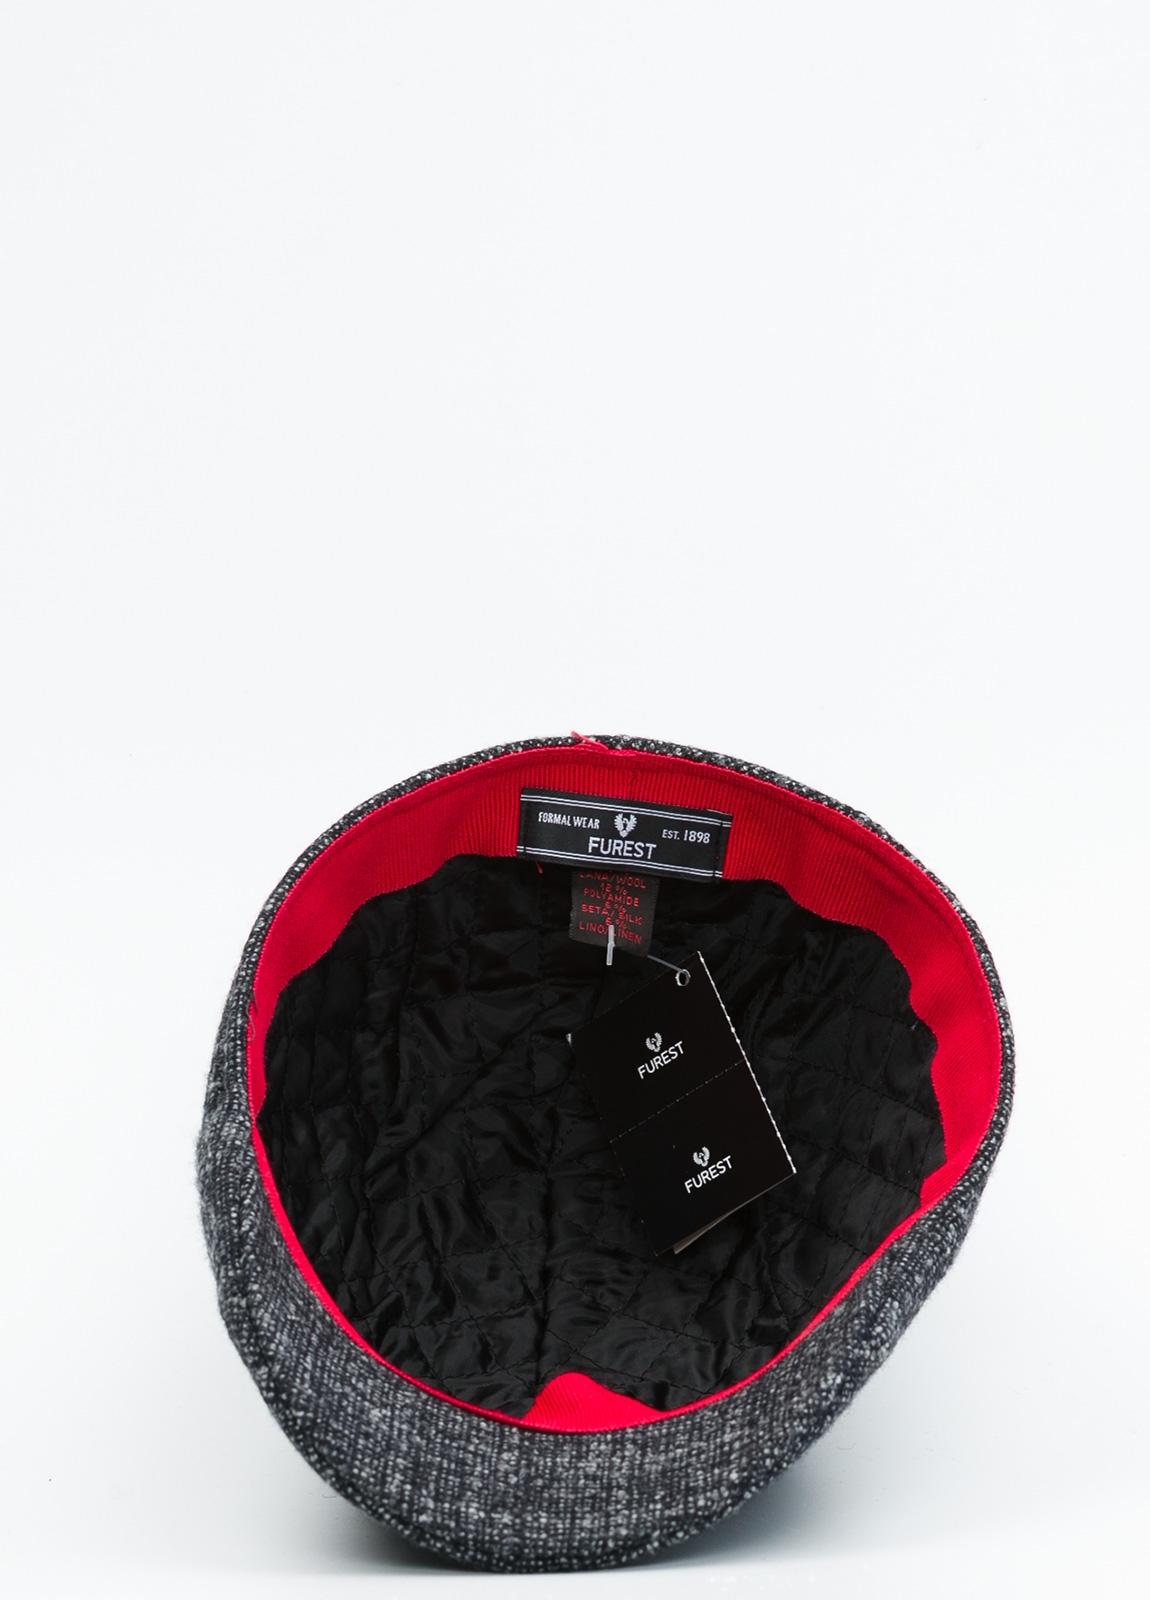 Gorra tipo ascot color gris tejido de lana con diseño jaspeado. - Ítem3